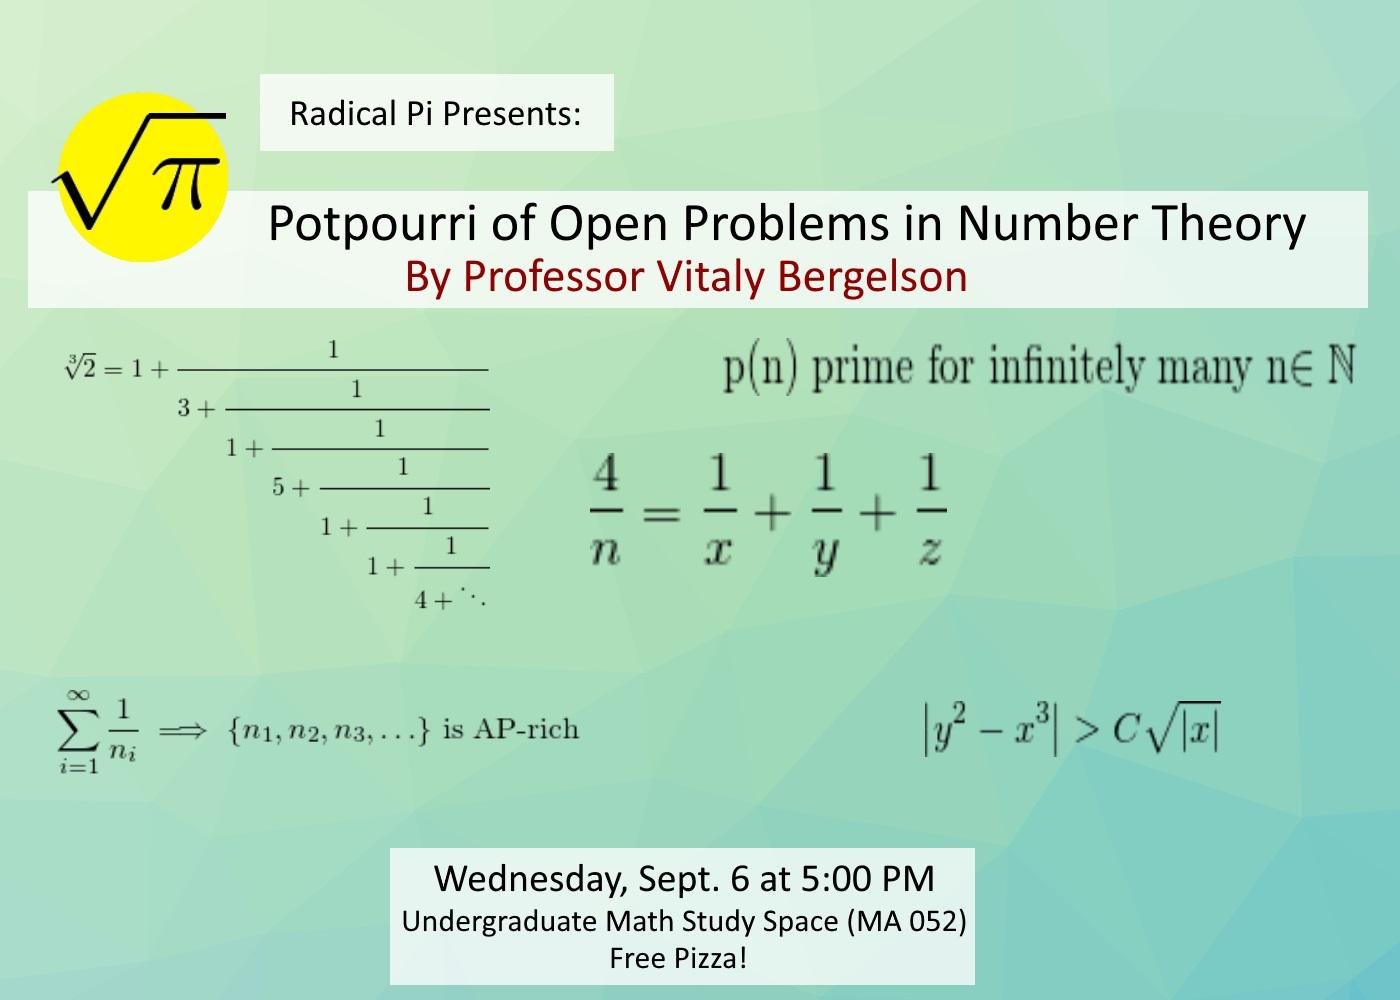 Radical Pi Math Club